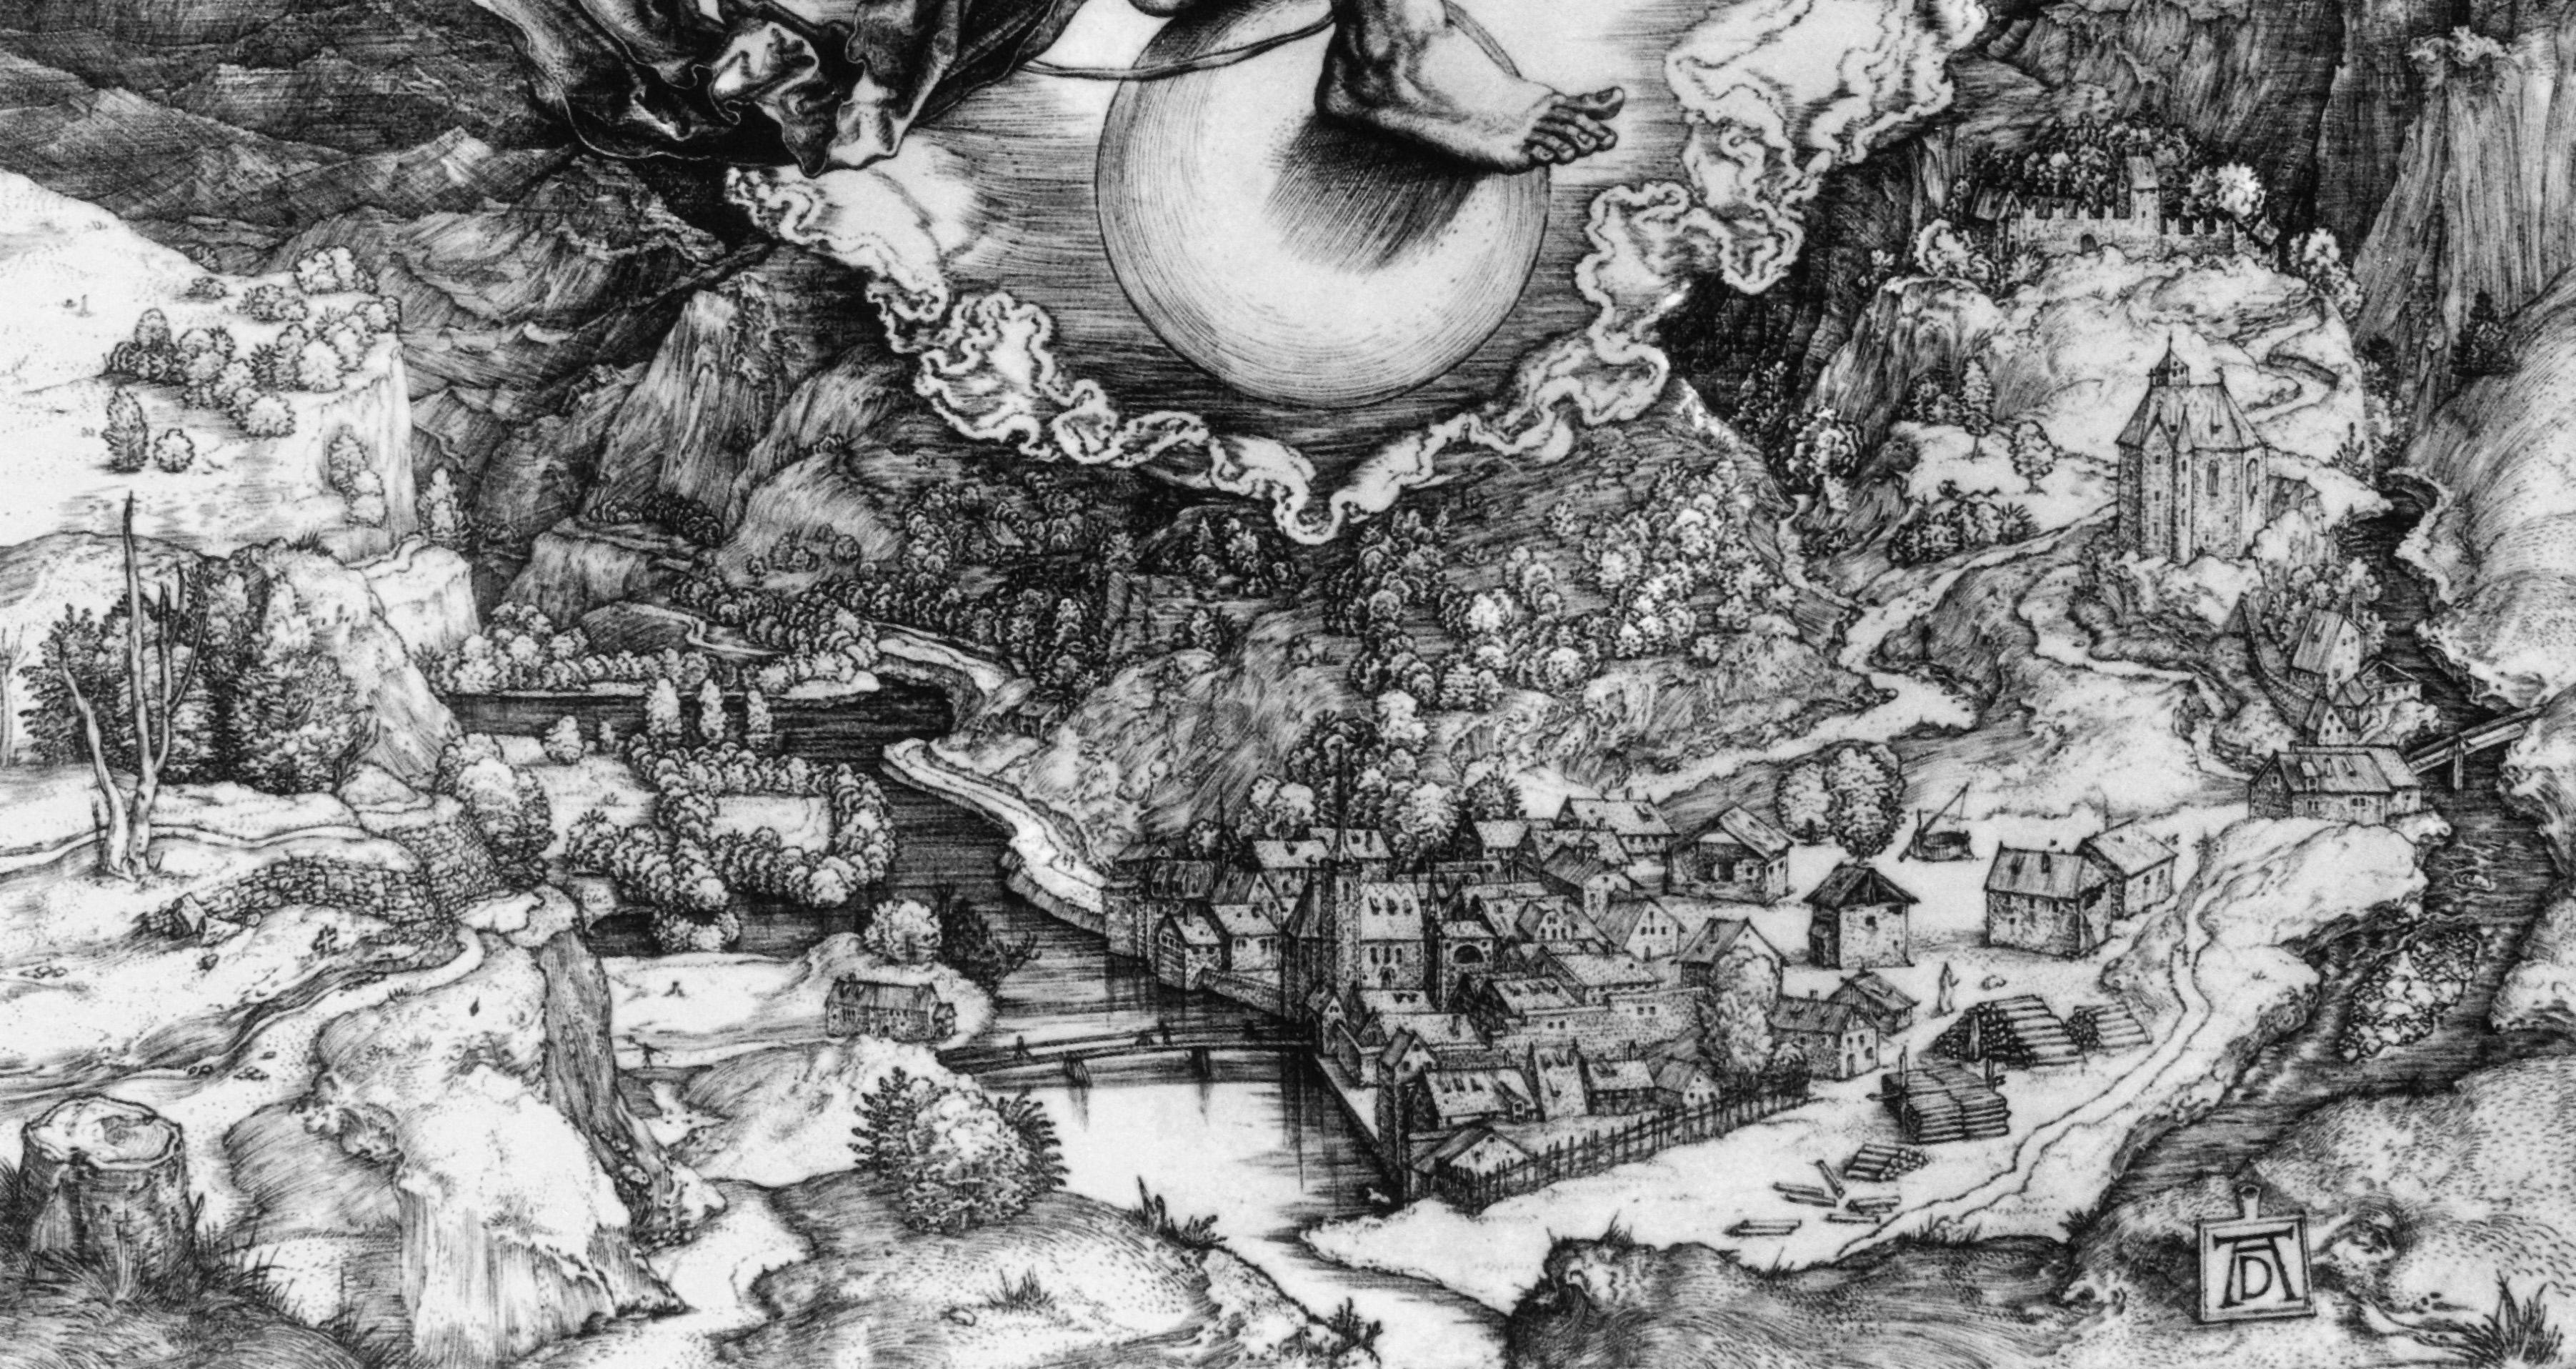 Nemesis Dürer ostyrol - La conjuration de Némésis